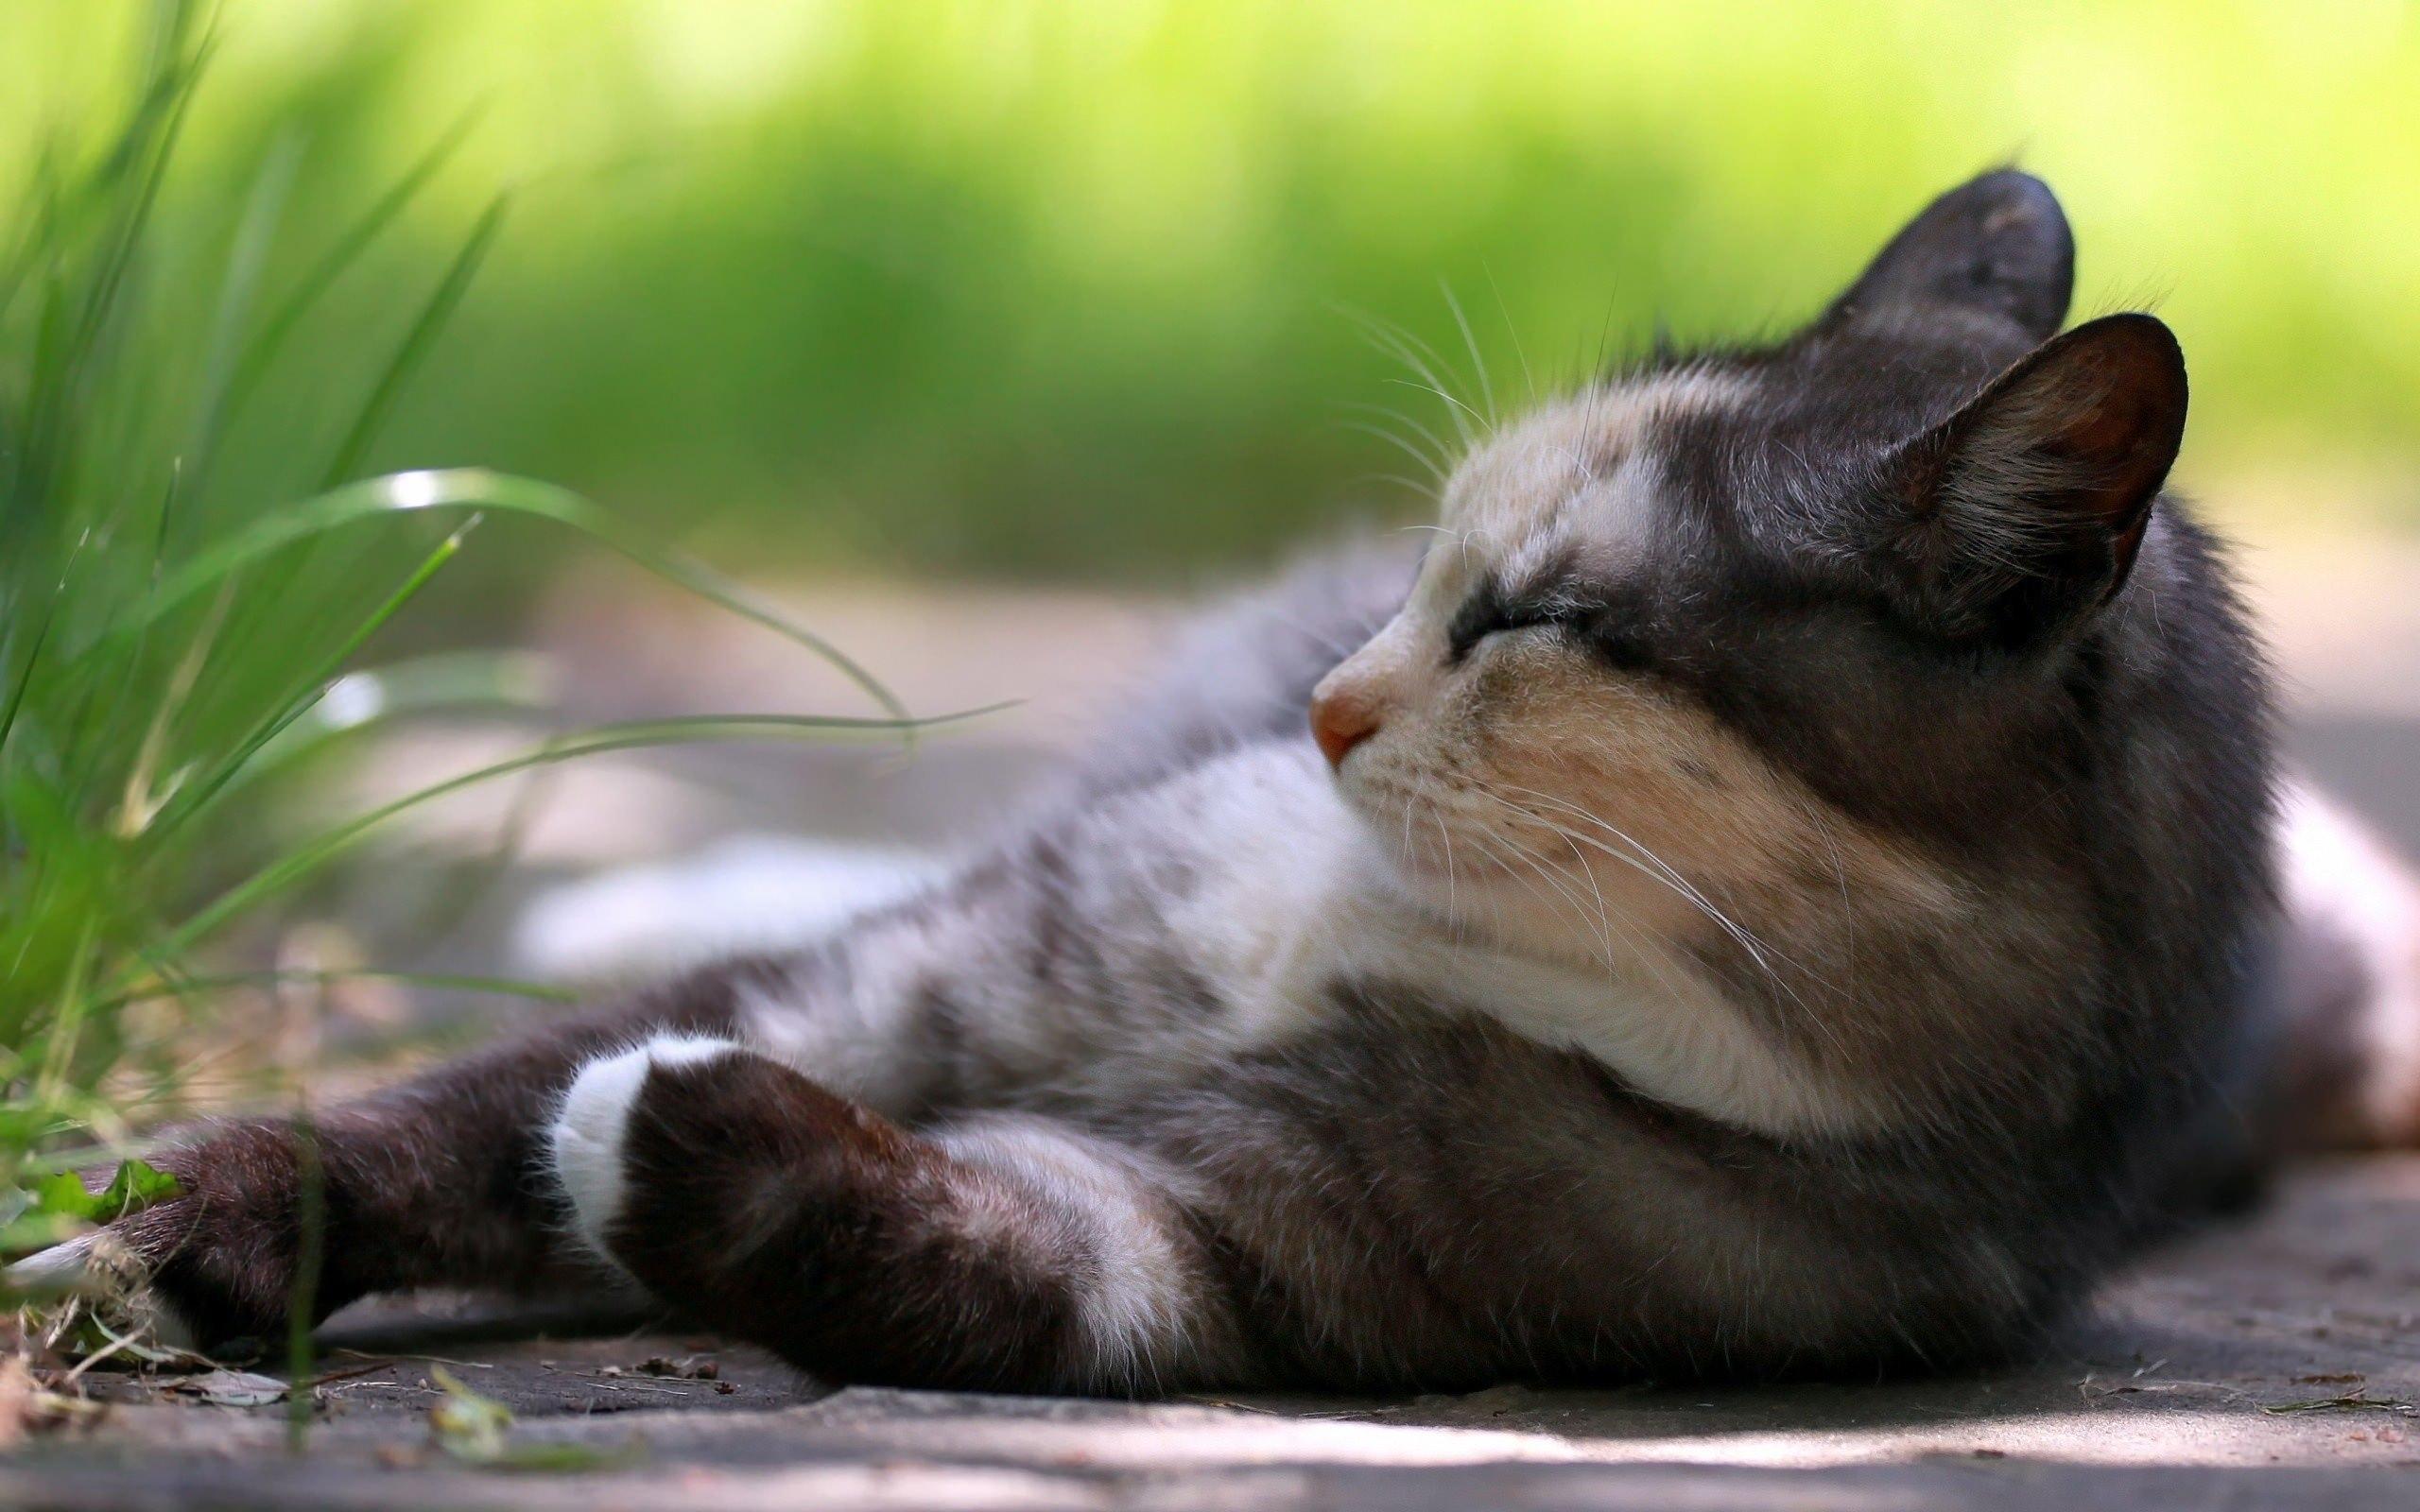 отдыхай котик картинки уверен, что